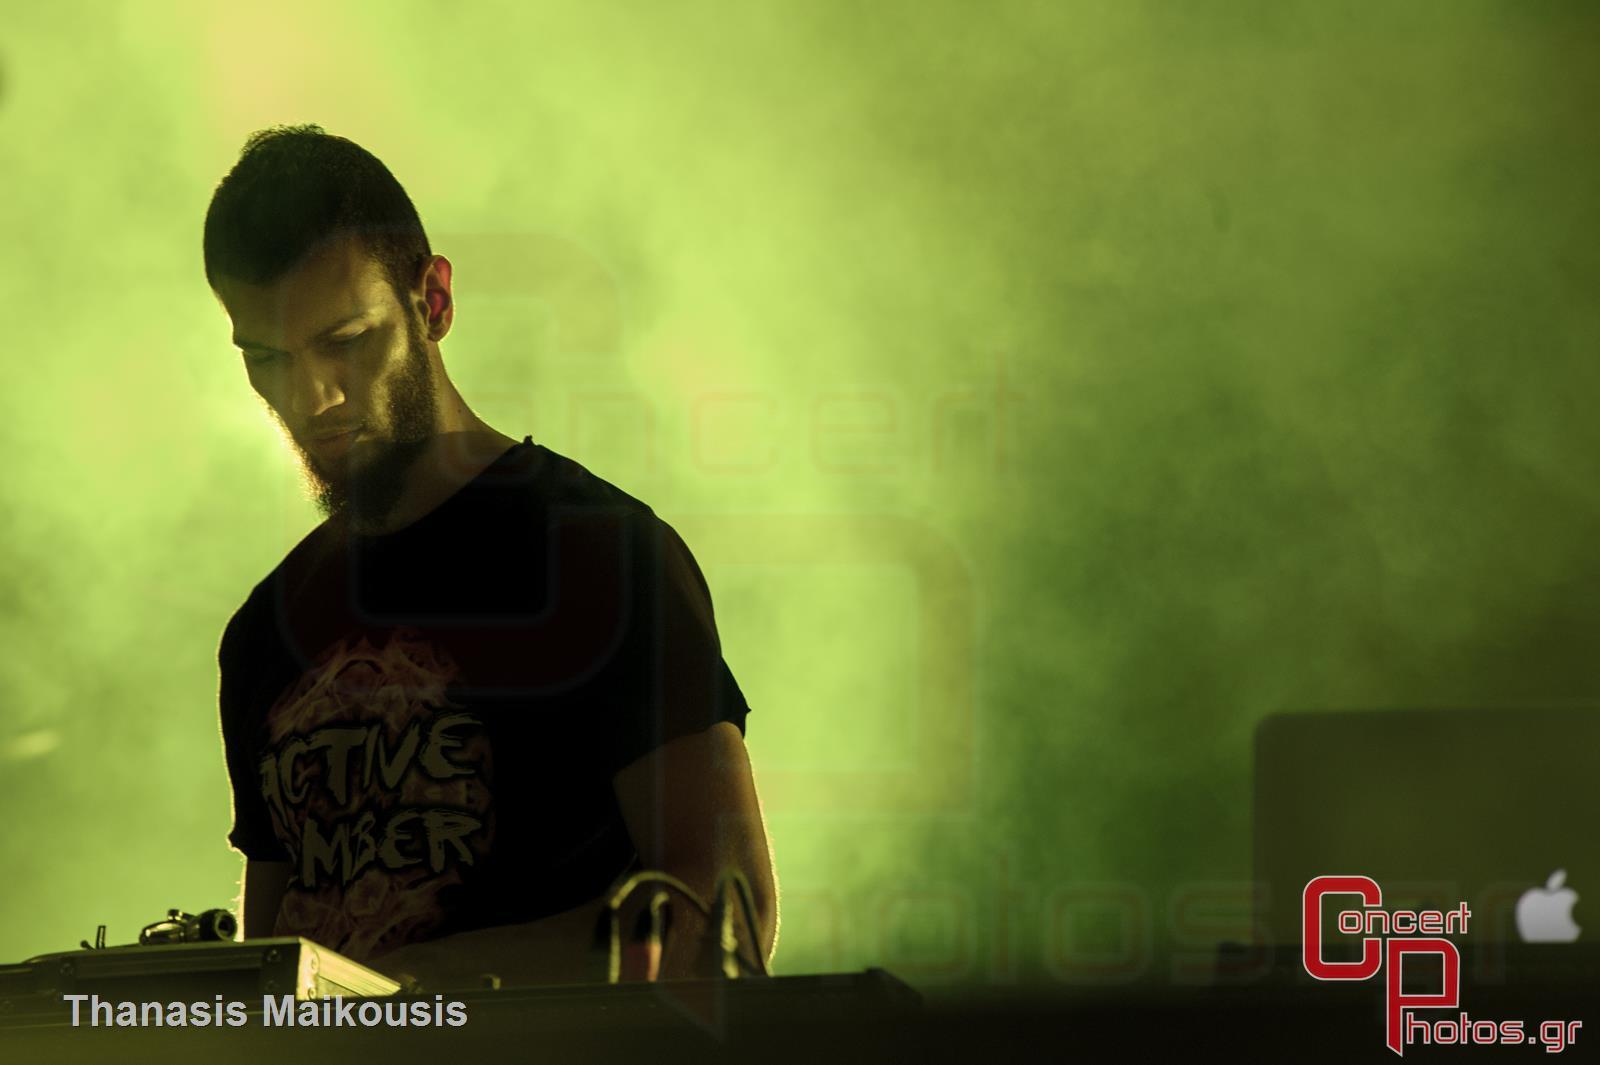 Active Member - Τραγούδα μας να φύγει το σκοτάδι- photographer: Thanasis Maikousis - concertphotos_-4905